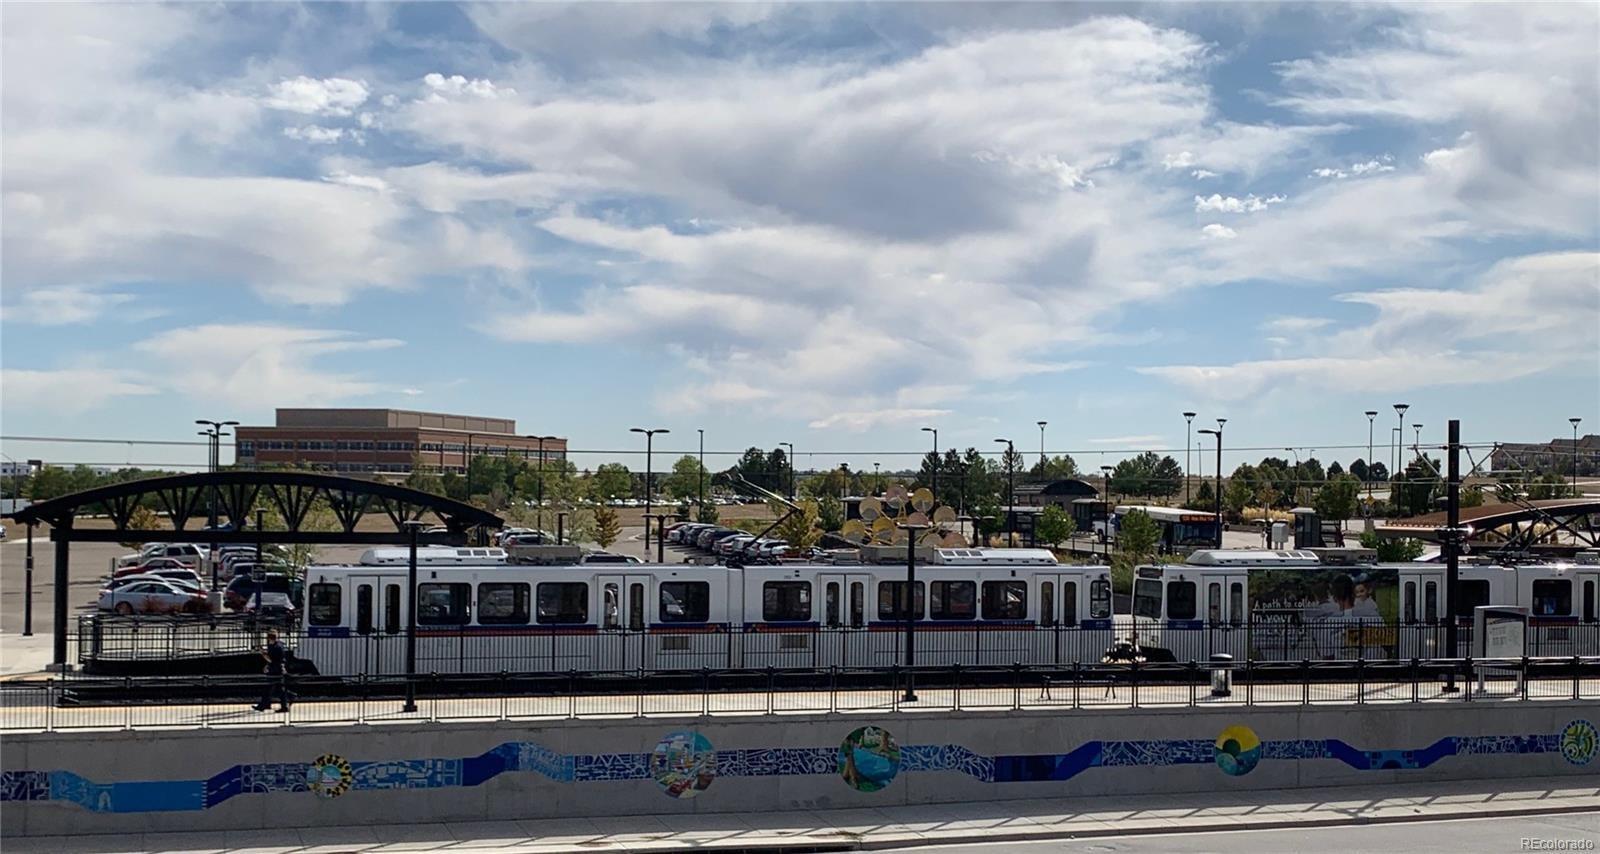 MLS# 8342775 - 1 - 91  S Sable Boulevard, Aurora, CO 80012